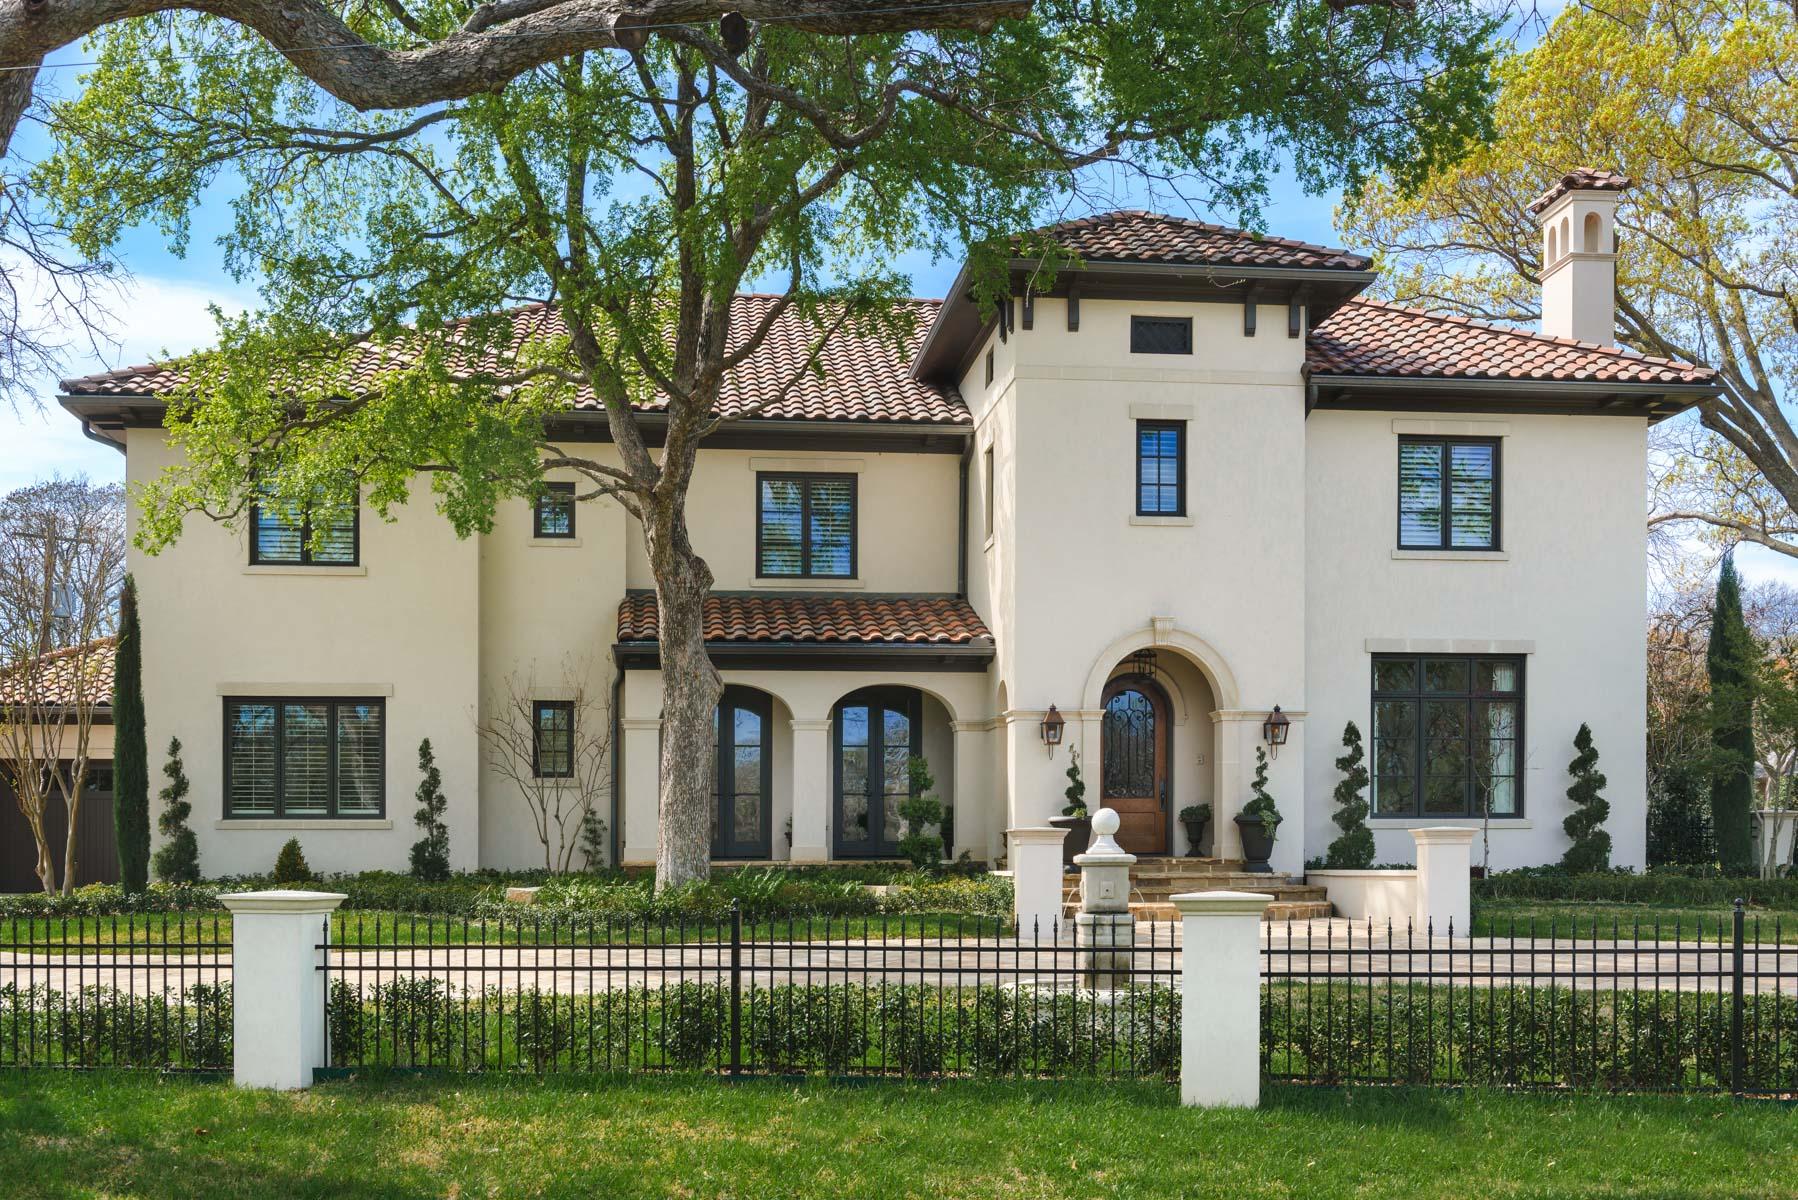 Single Family Home for Sale at 9447 Rockbrook Dr, Dallas Dallas, Texas, 75220 United States